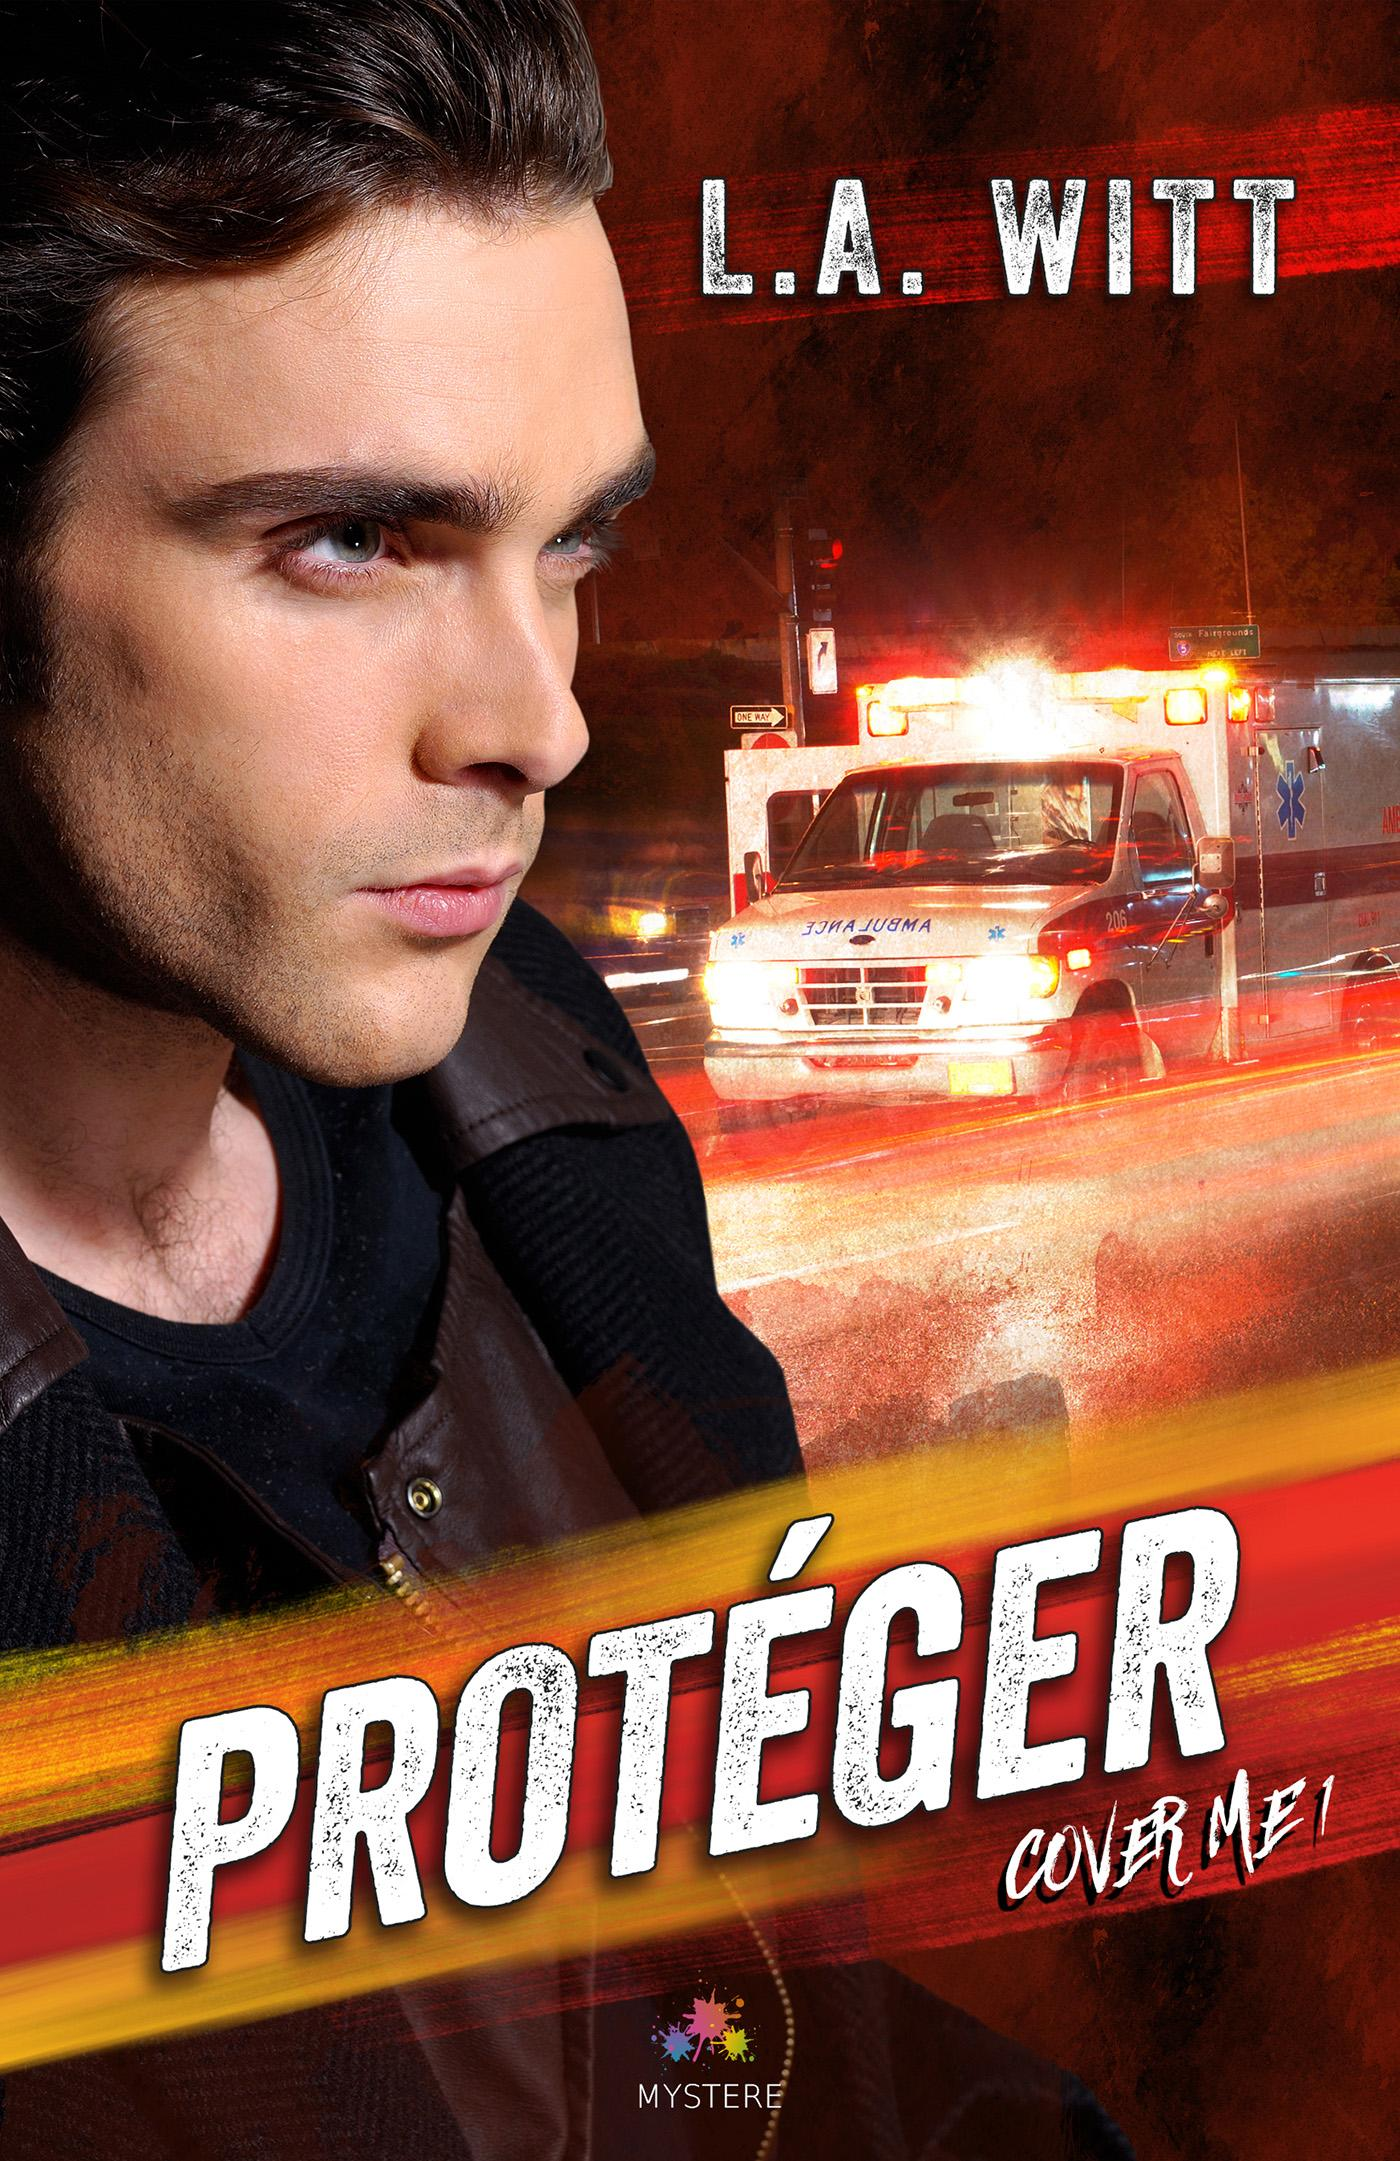 Protéger, COVER ME, T1